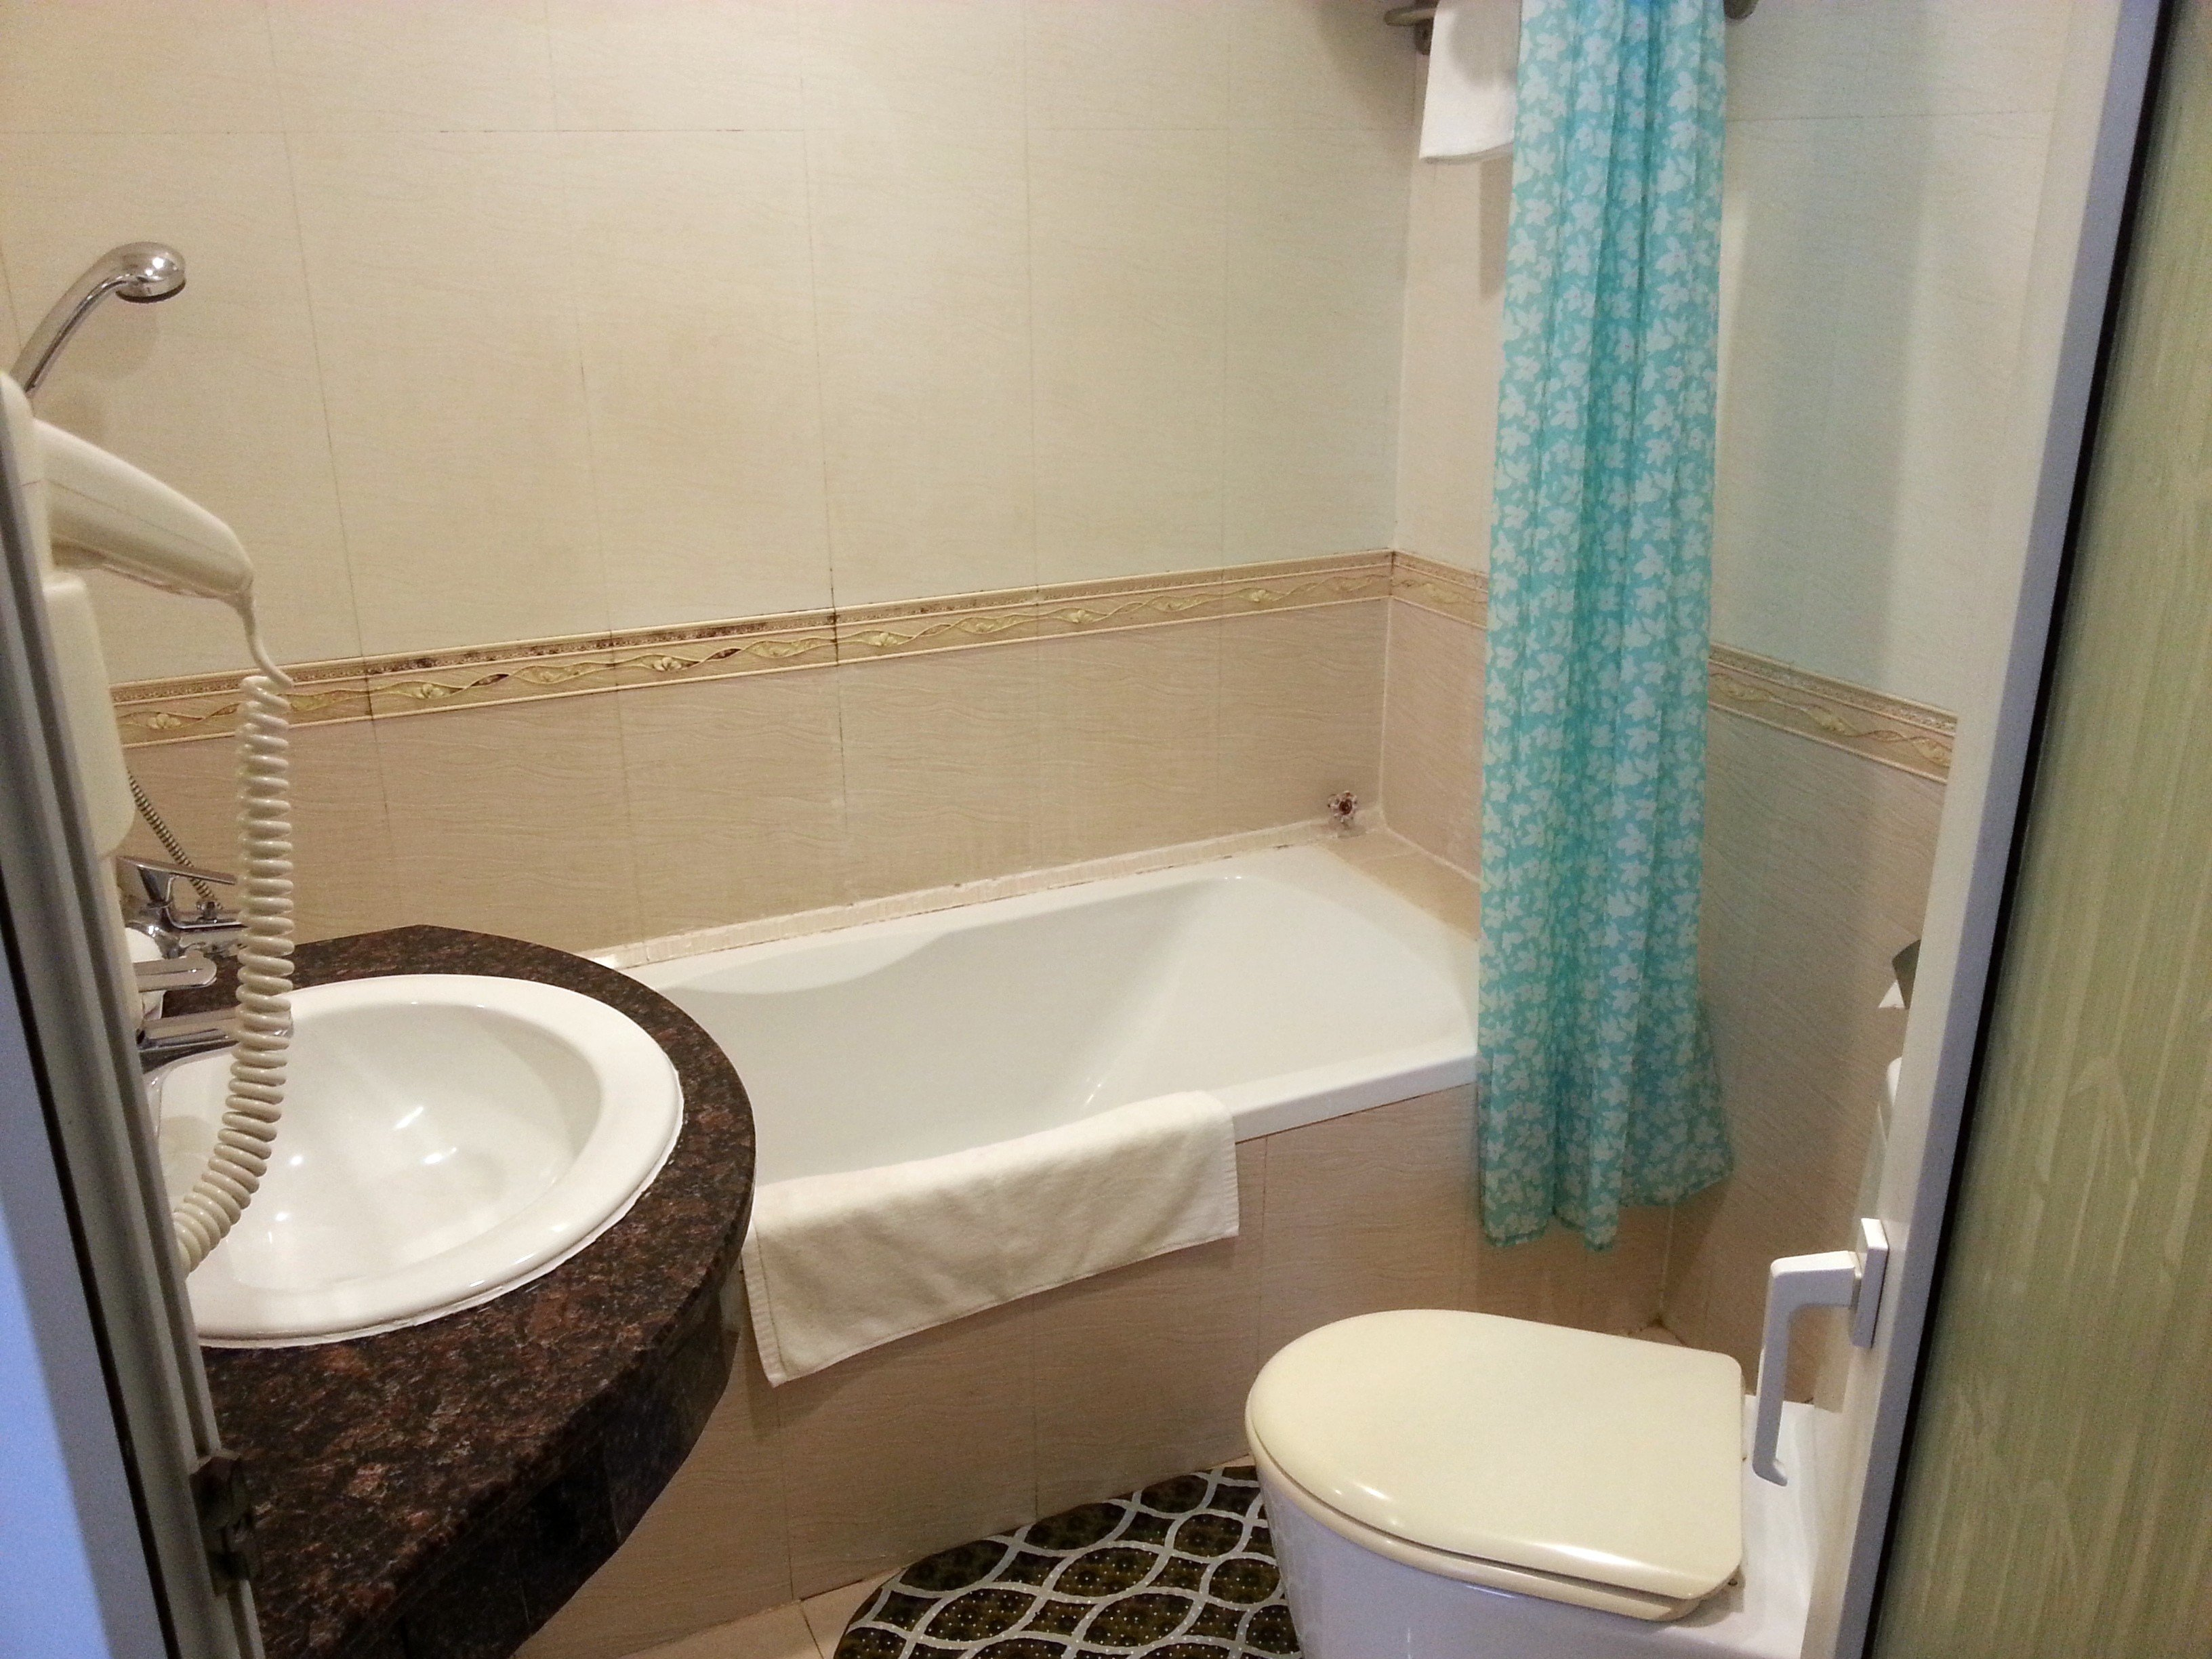 Bathroom at the Prince II Hotel